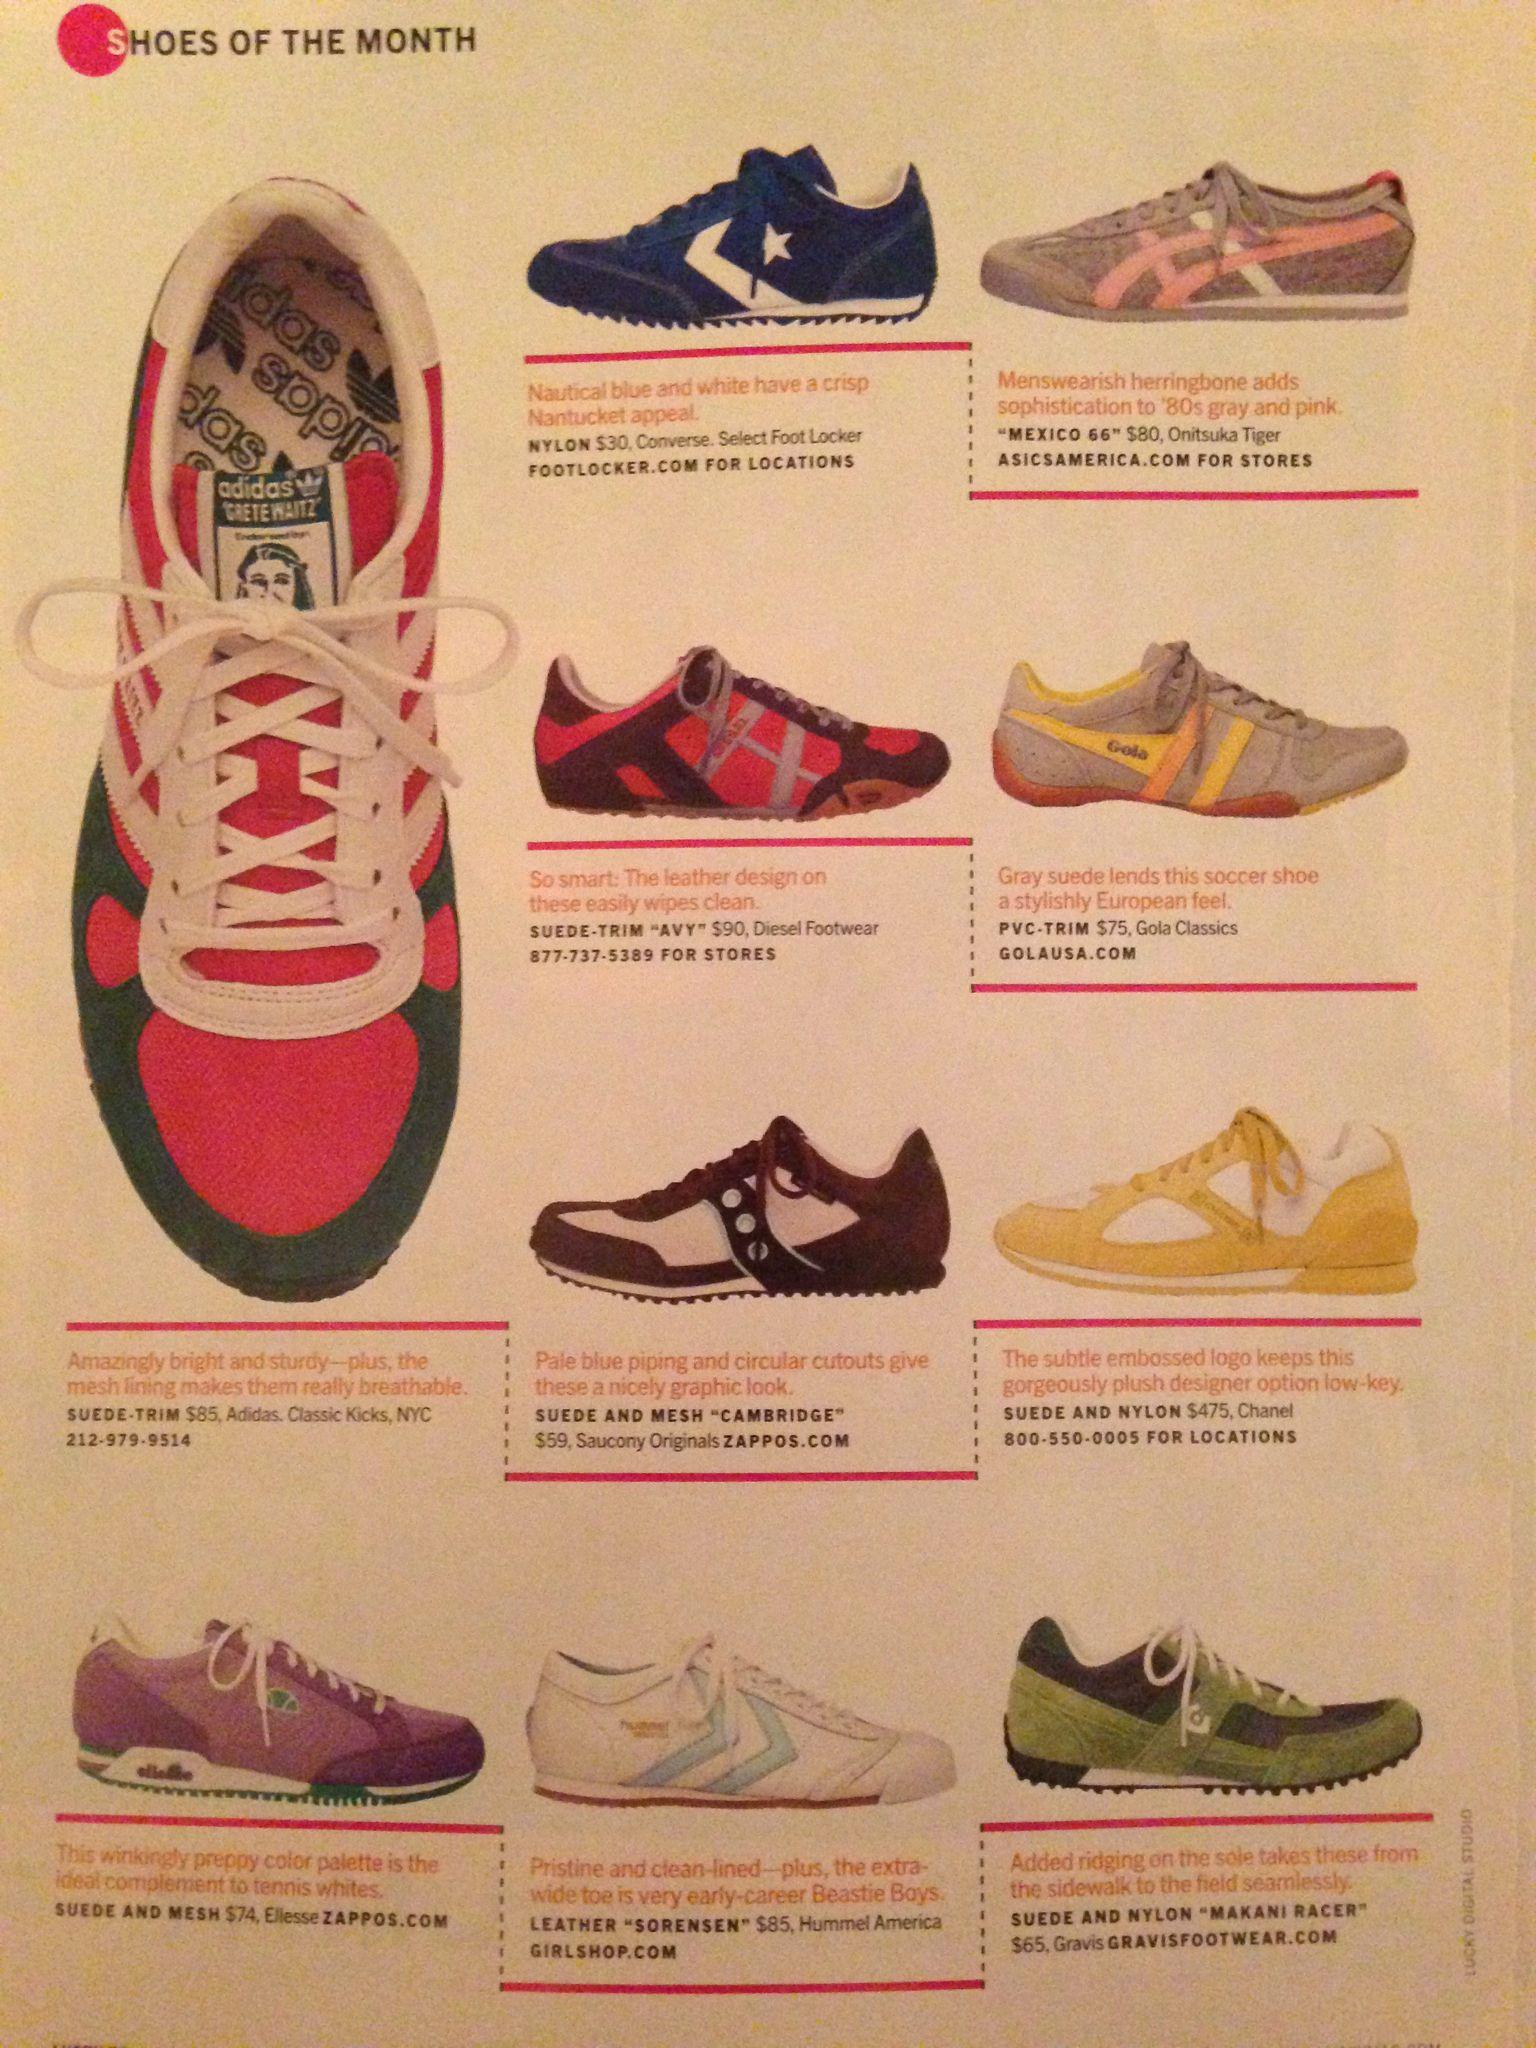 Leather design, Soccer shoe, Foot locker